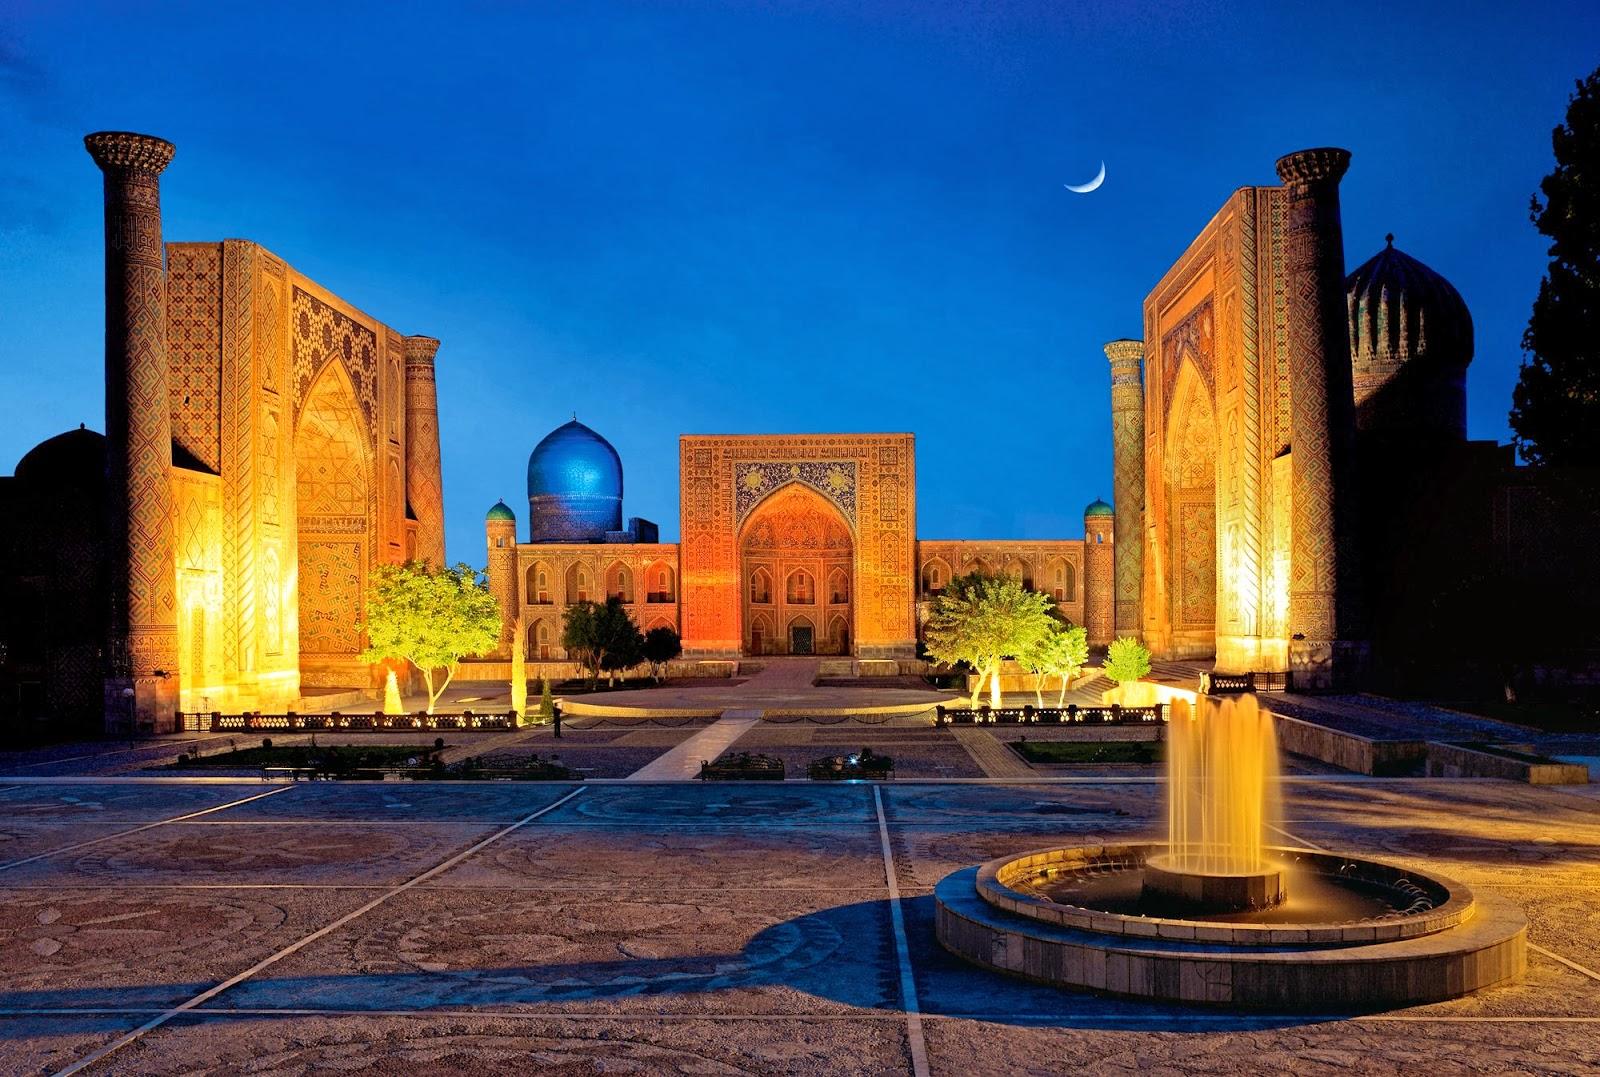 samarkand-the-famous-city-on-the-silk-road-secret-world